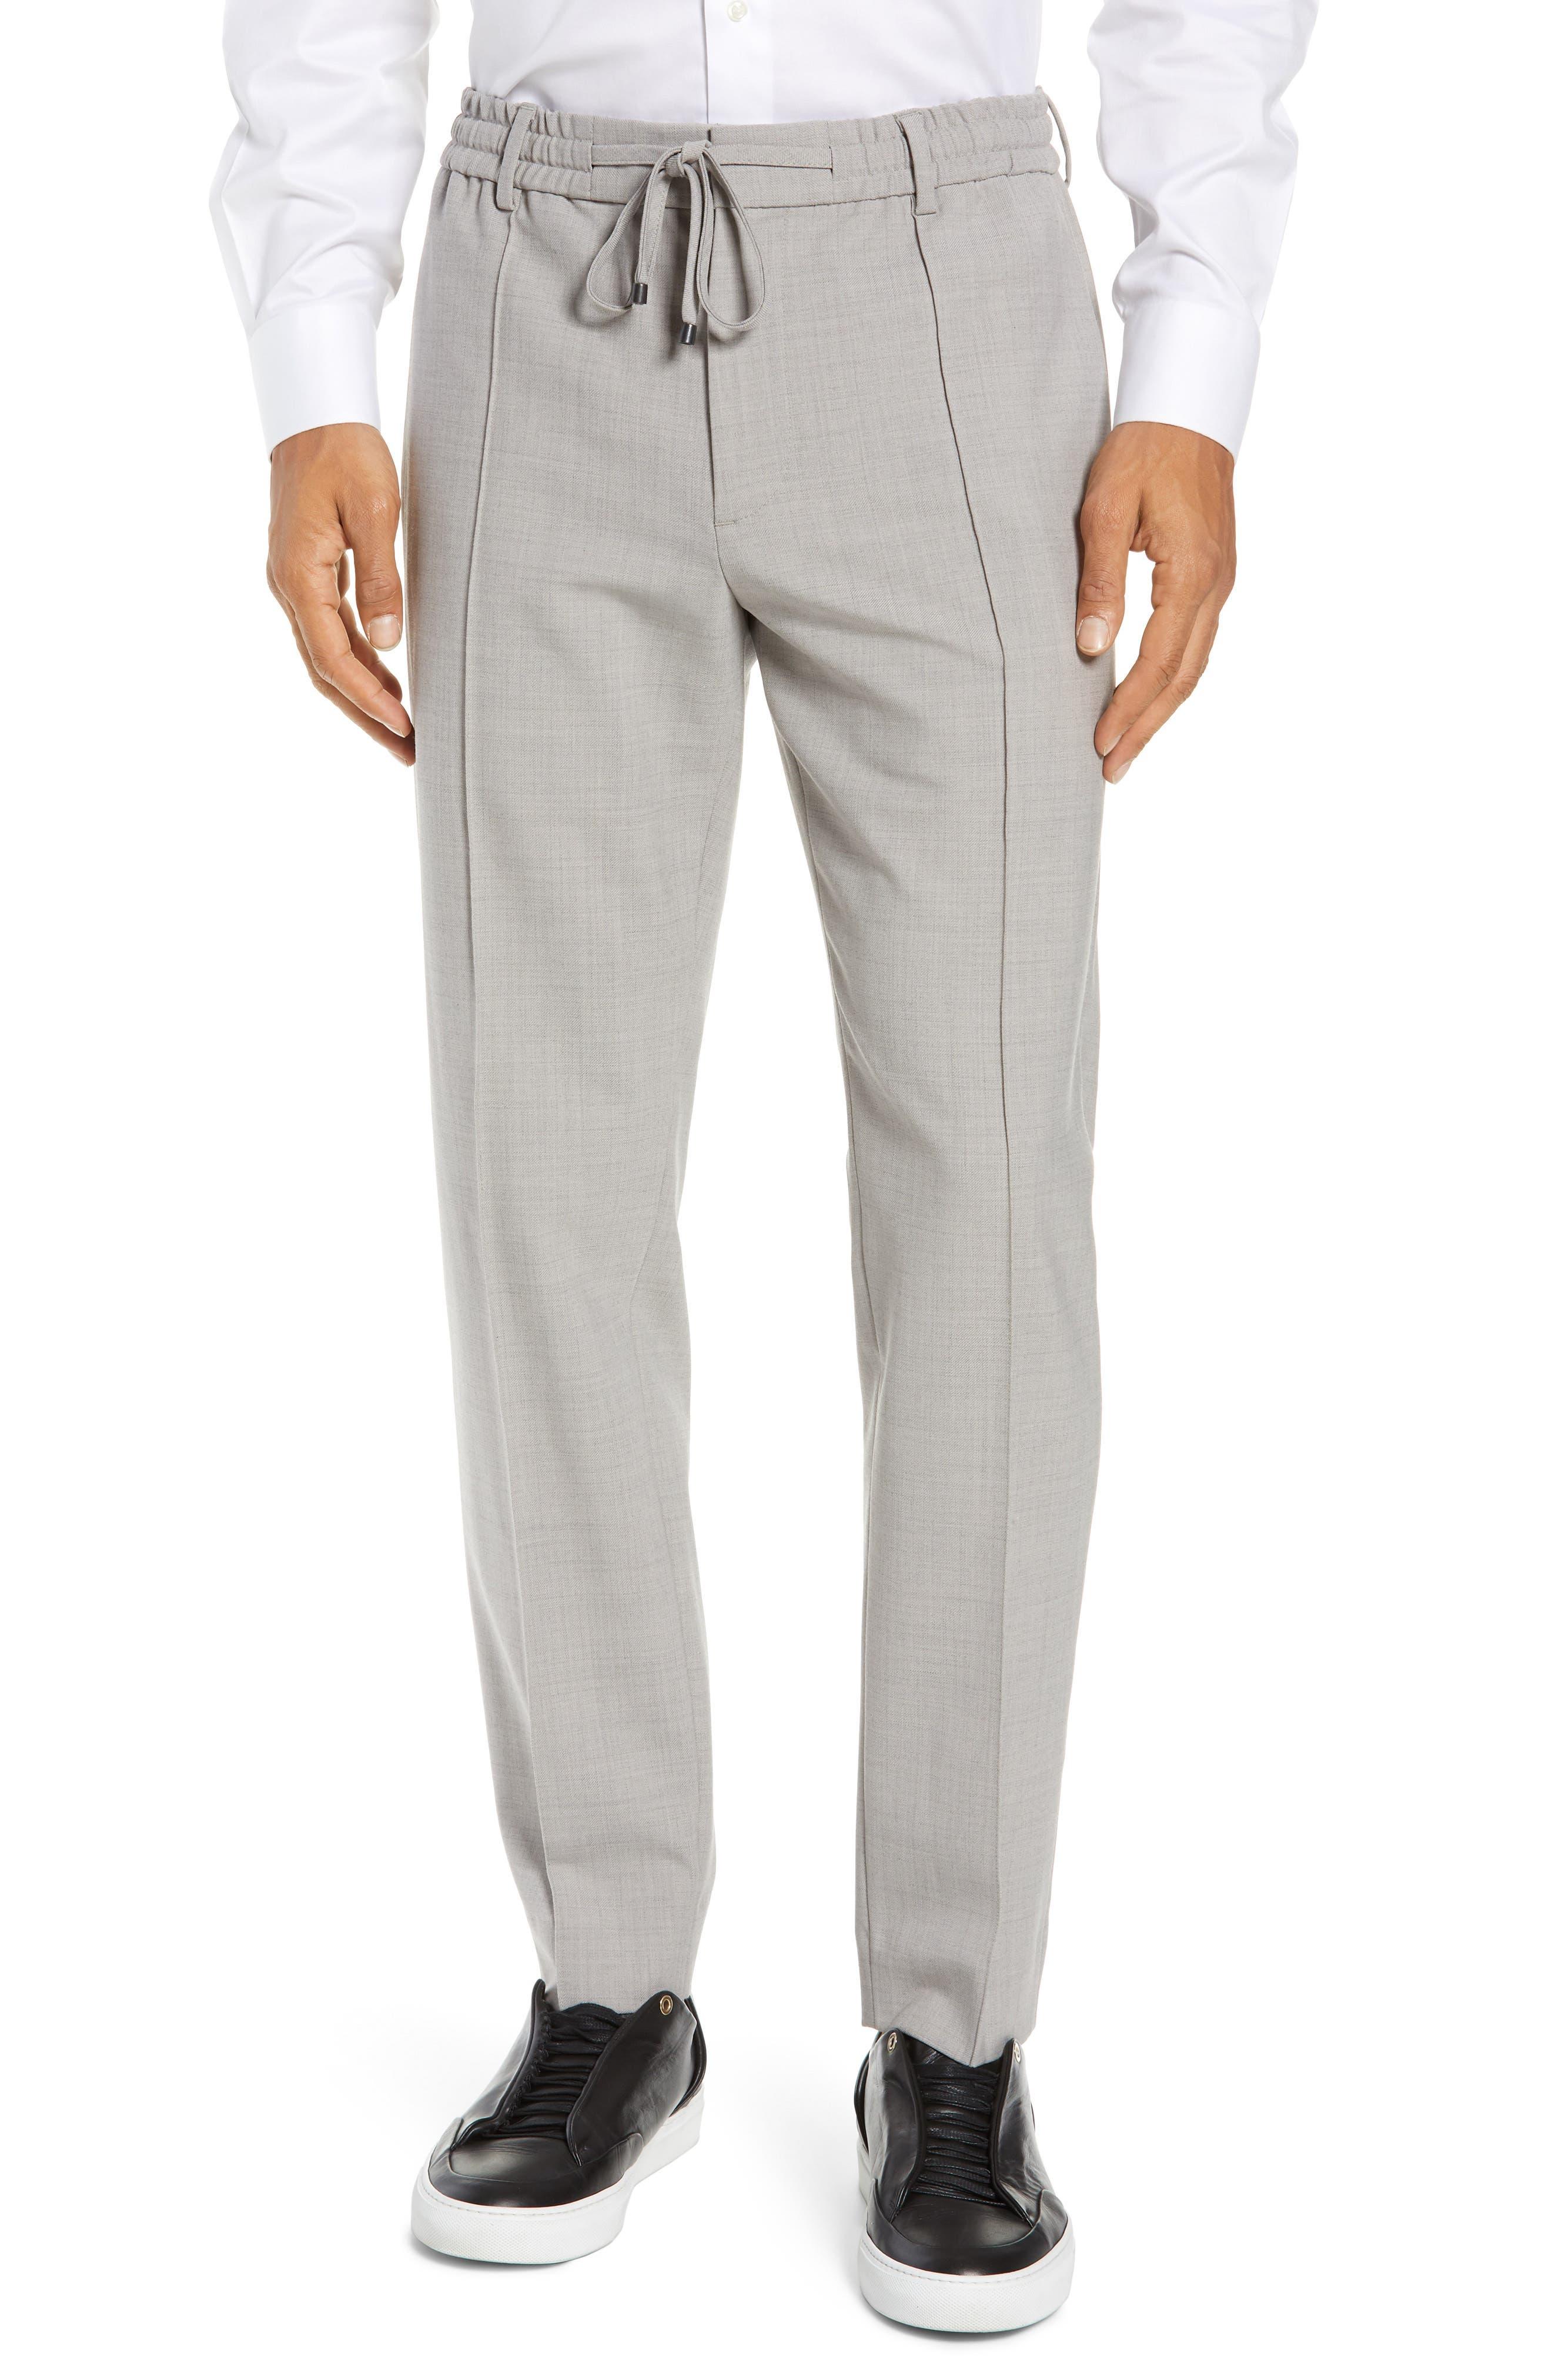 CLUB MONACO,                             Trim Fit Pintuck Pants,                             Main thumbnail 1, color,                             HEATHER GREY